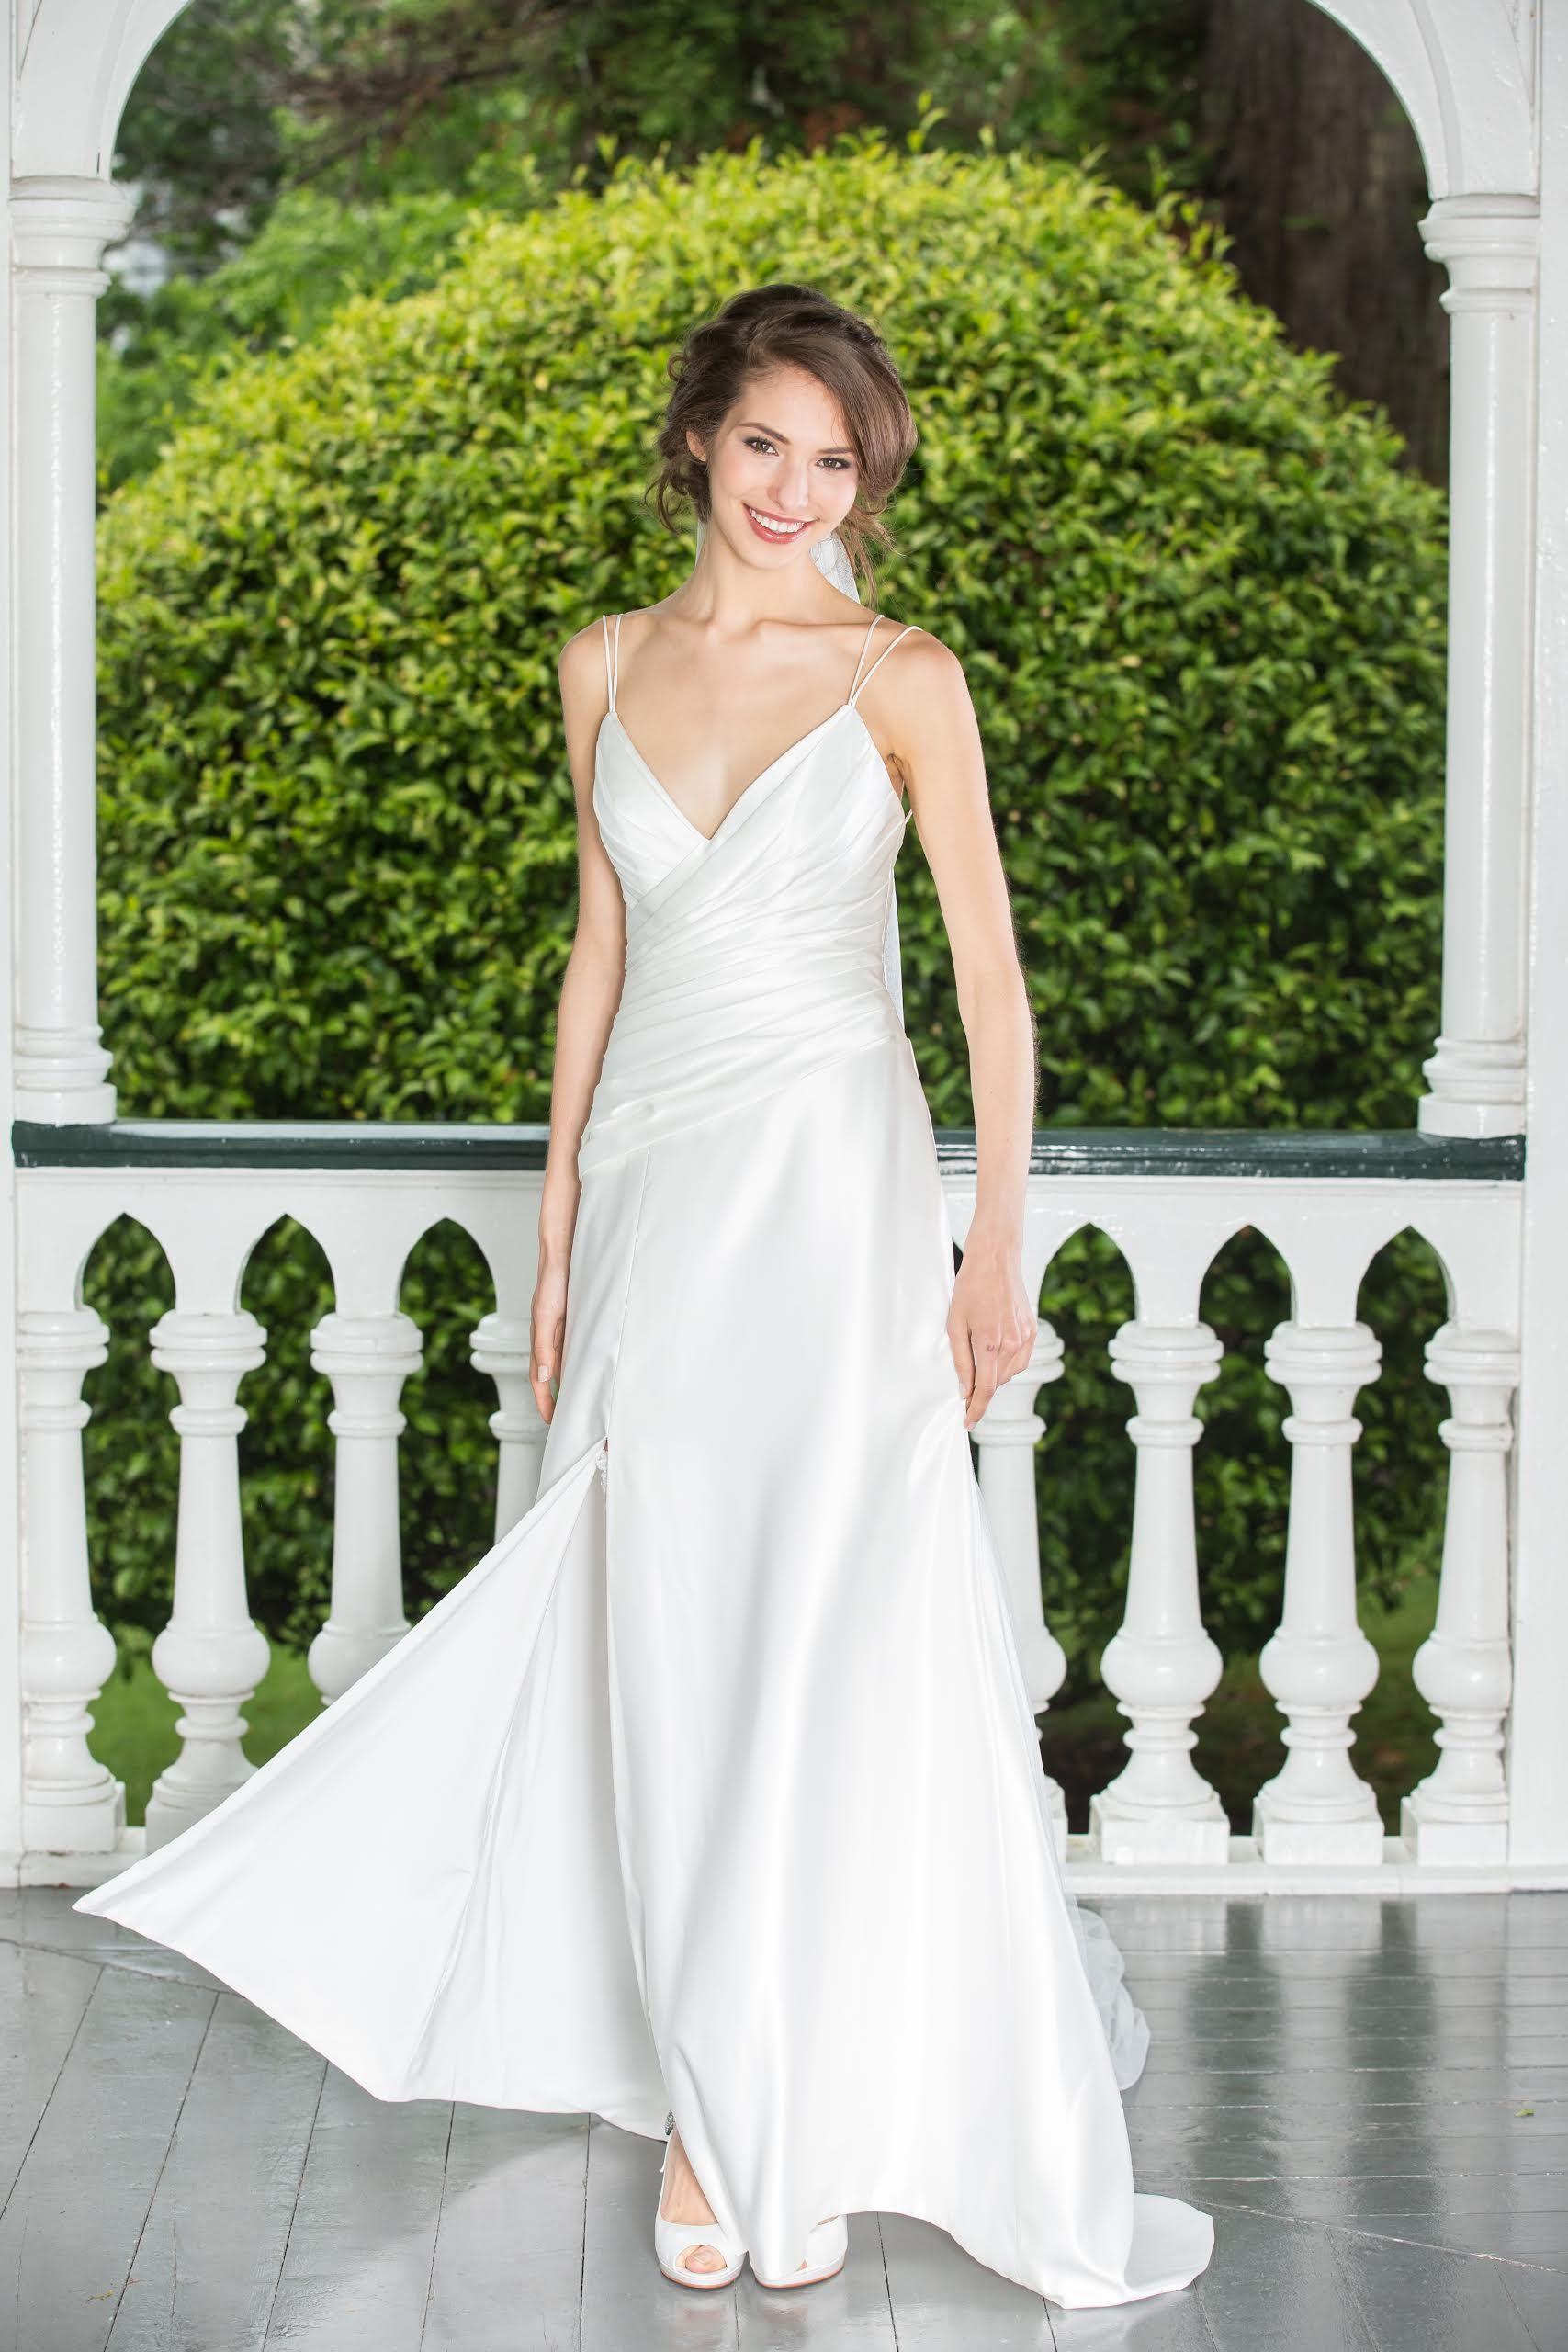 Centauria wedding dresses pinterest wedding dress gowns and